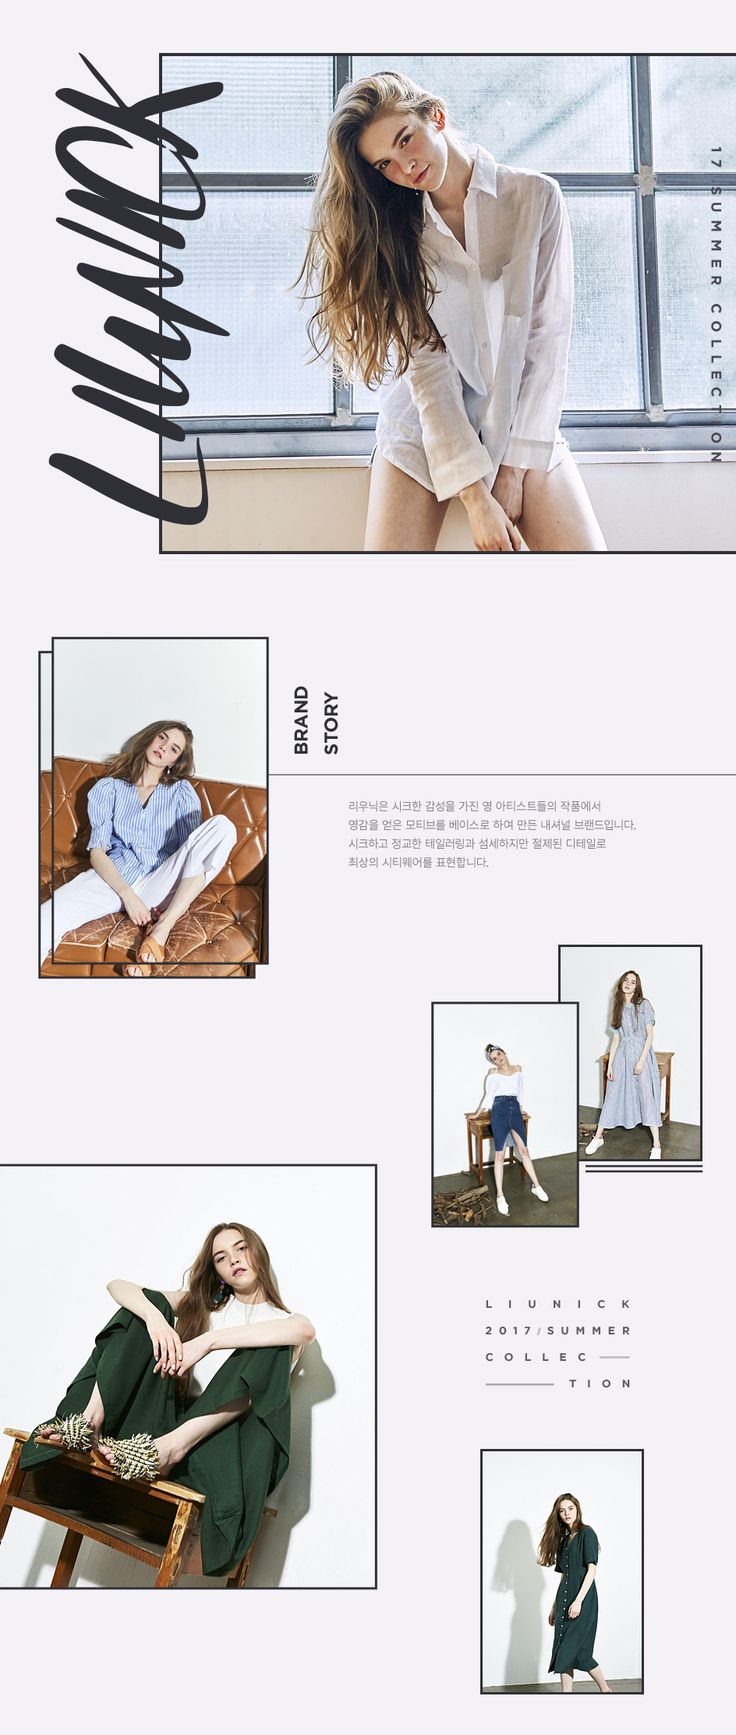 WIZWID:위즈위드 - 글로벌 쇼핑 네트워크 여성 의류 우먼 패션 기획전 LIUNICK 17 S/S 신상 추가입고 1주한정 35%세일+5%쿠폰!